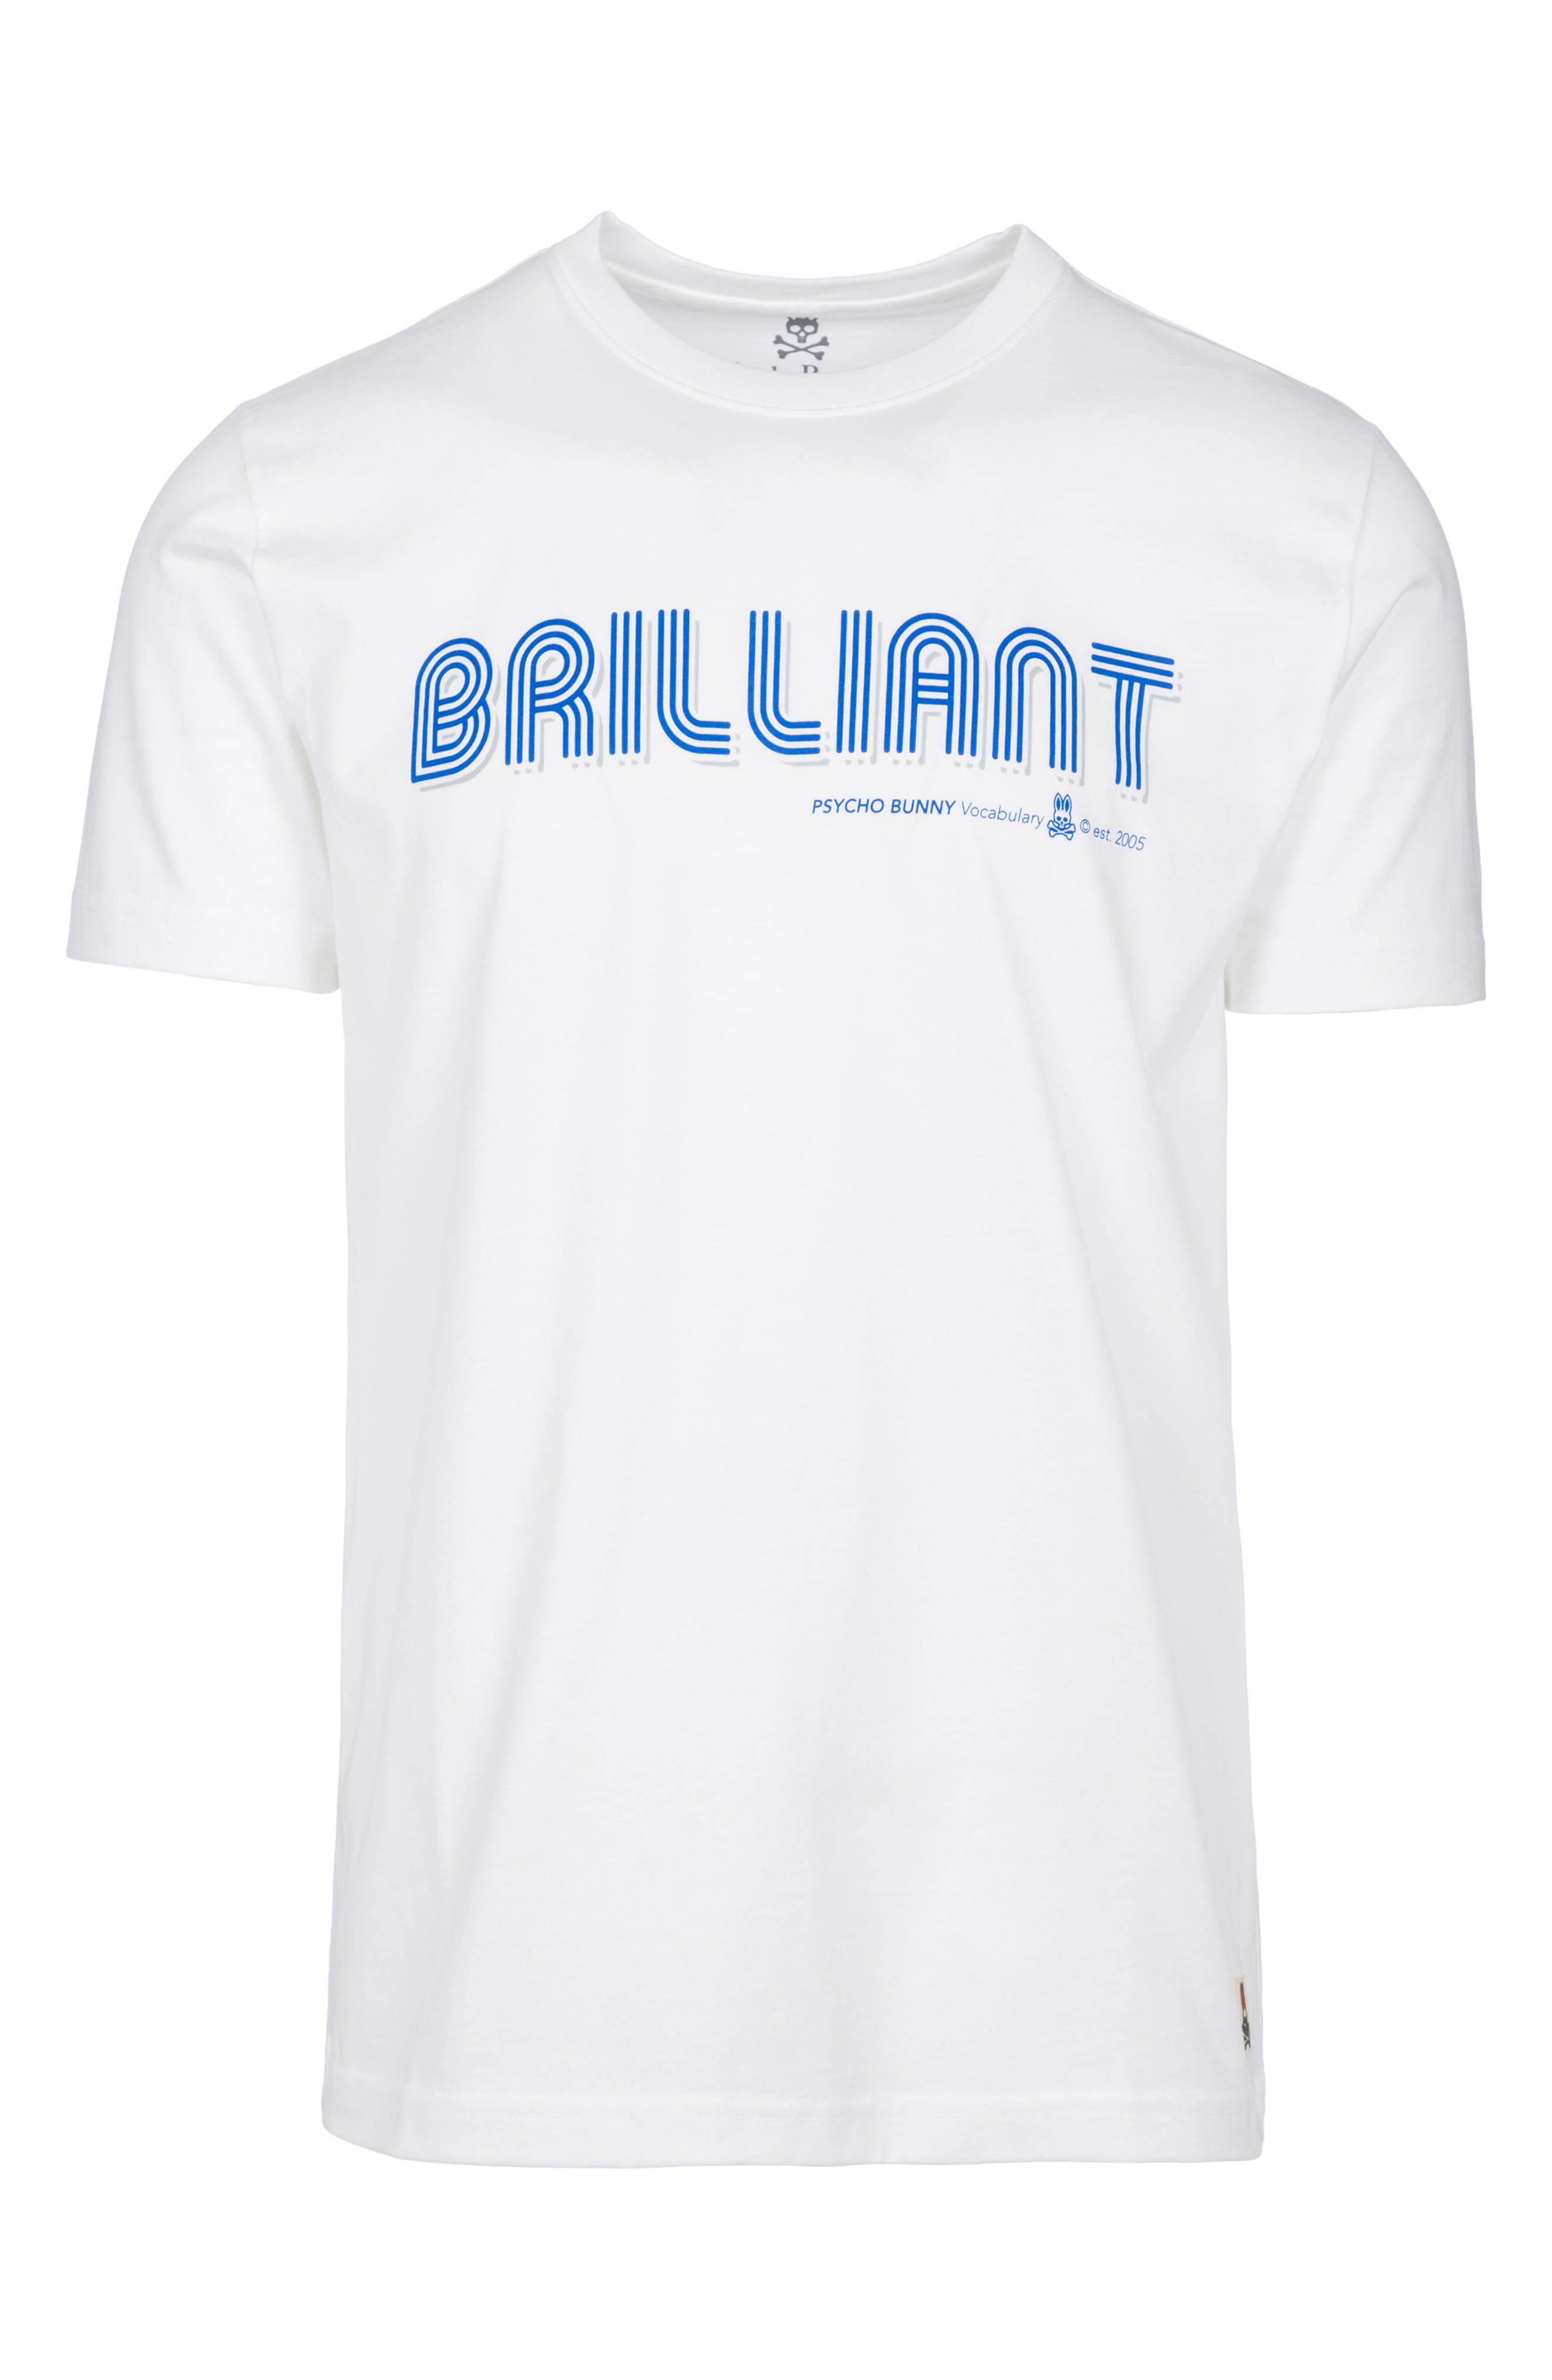 Brilliant Graphic T-Shirt,                             Main thumbnail 1, color,                             100